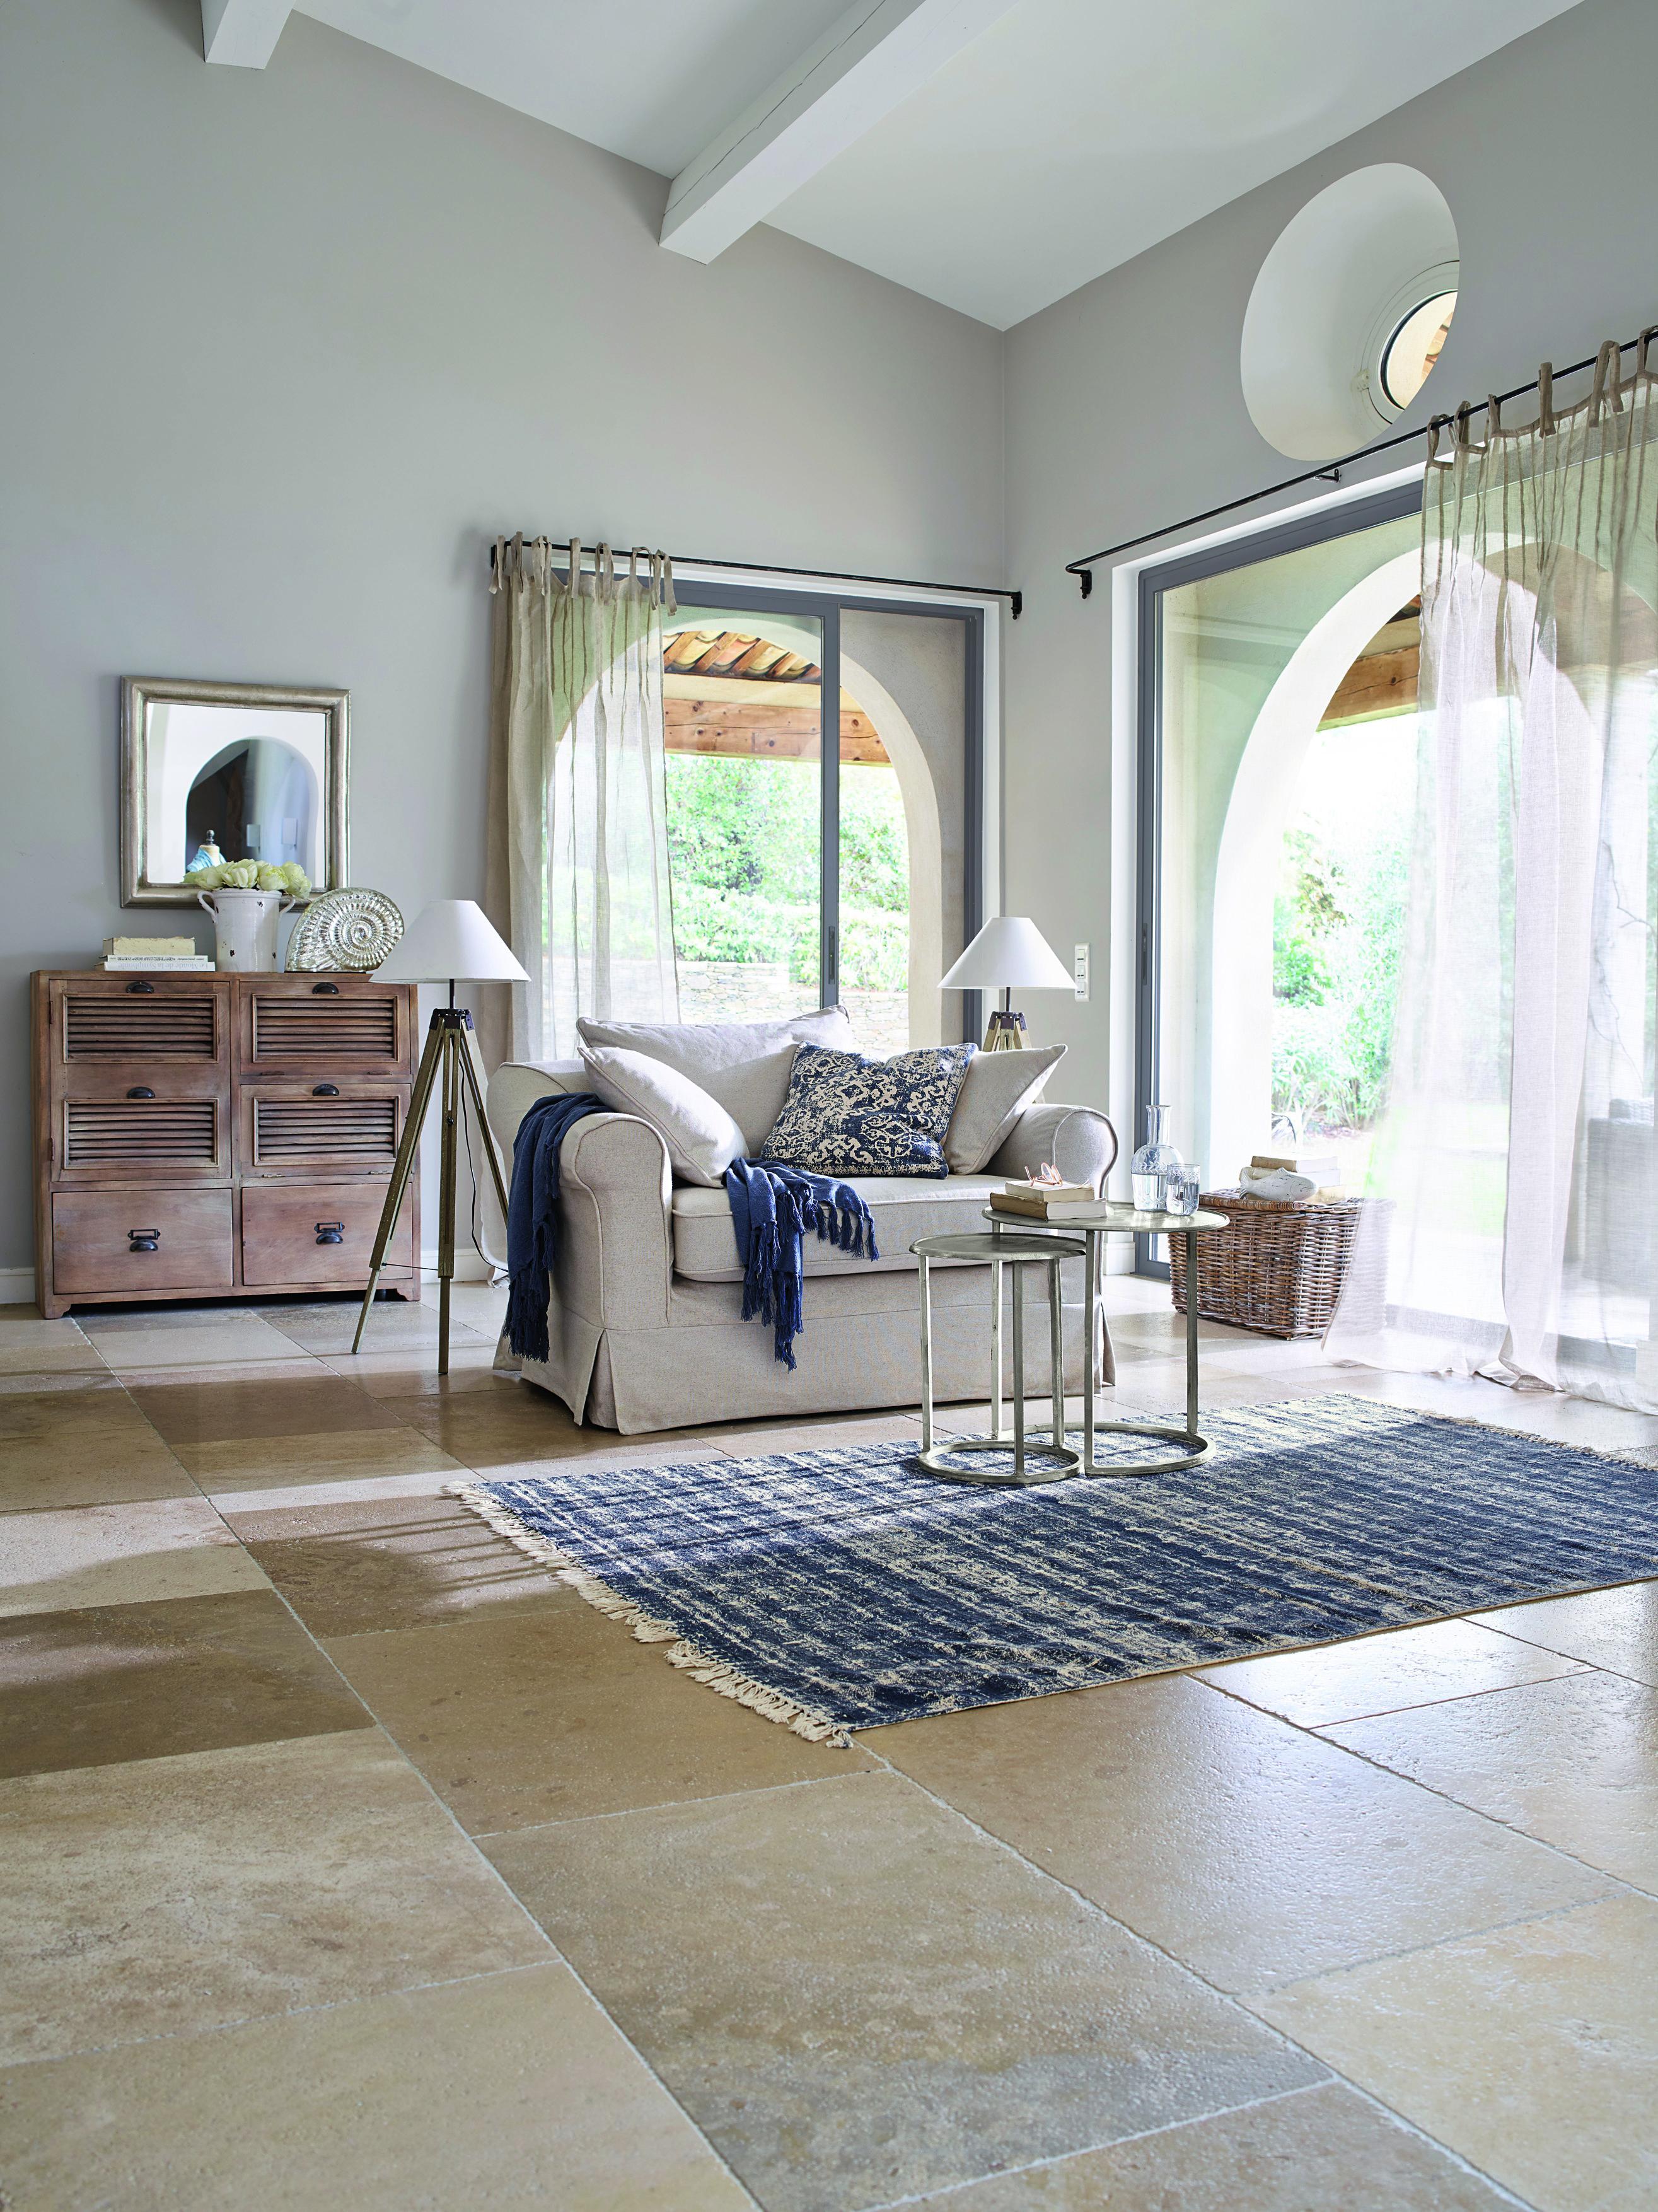 holztruhe bilder ideen couchstyle. Black Bedroom Furniture Sets. Home Design Ideas